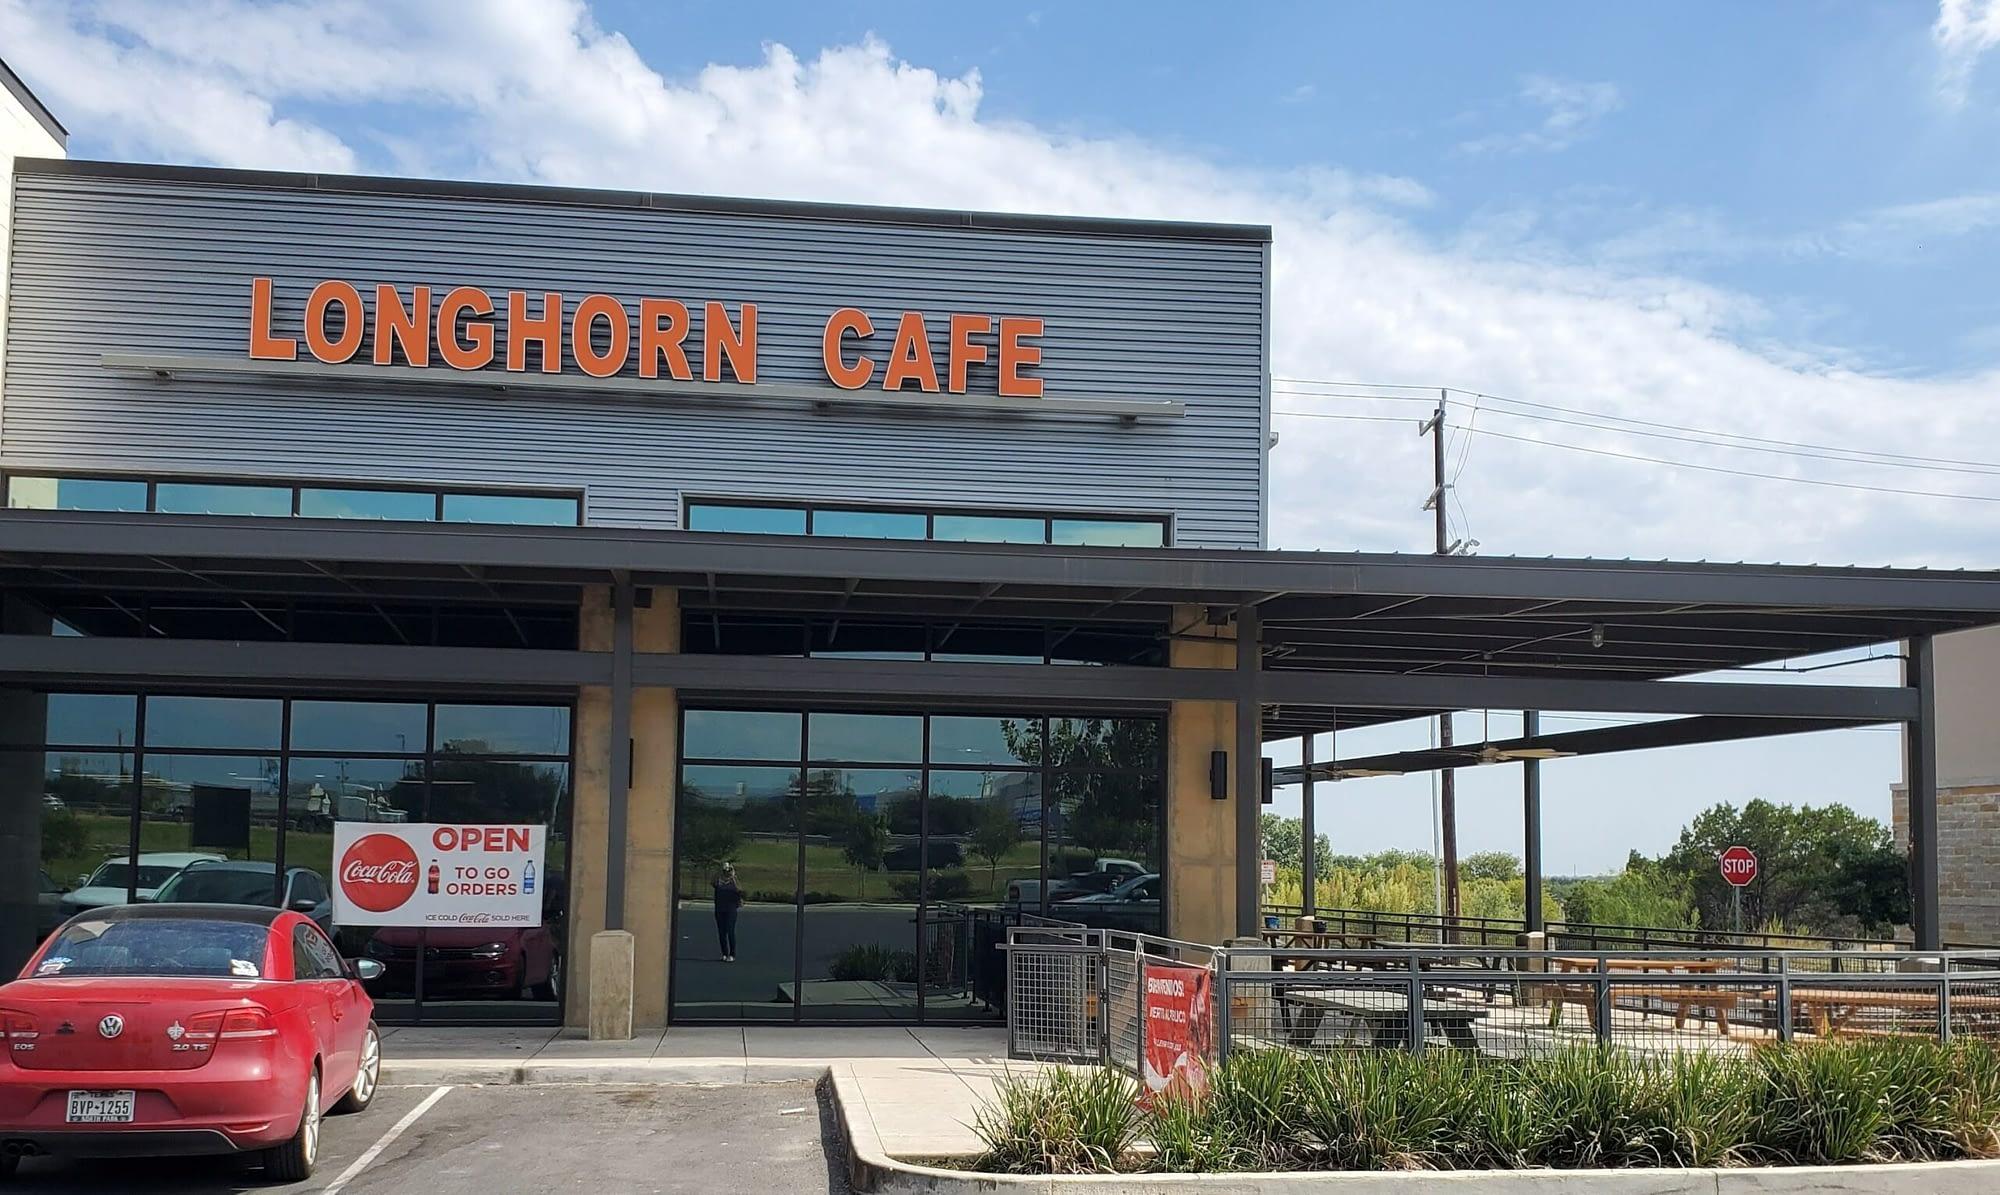 longhorn cafe exterior